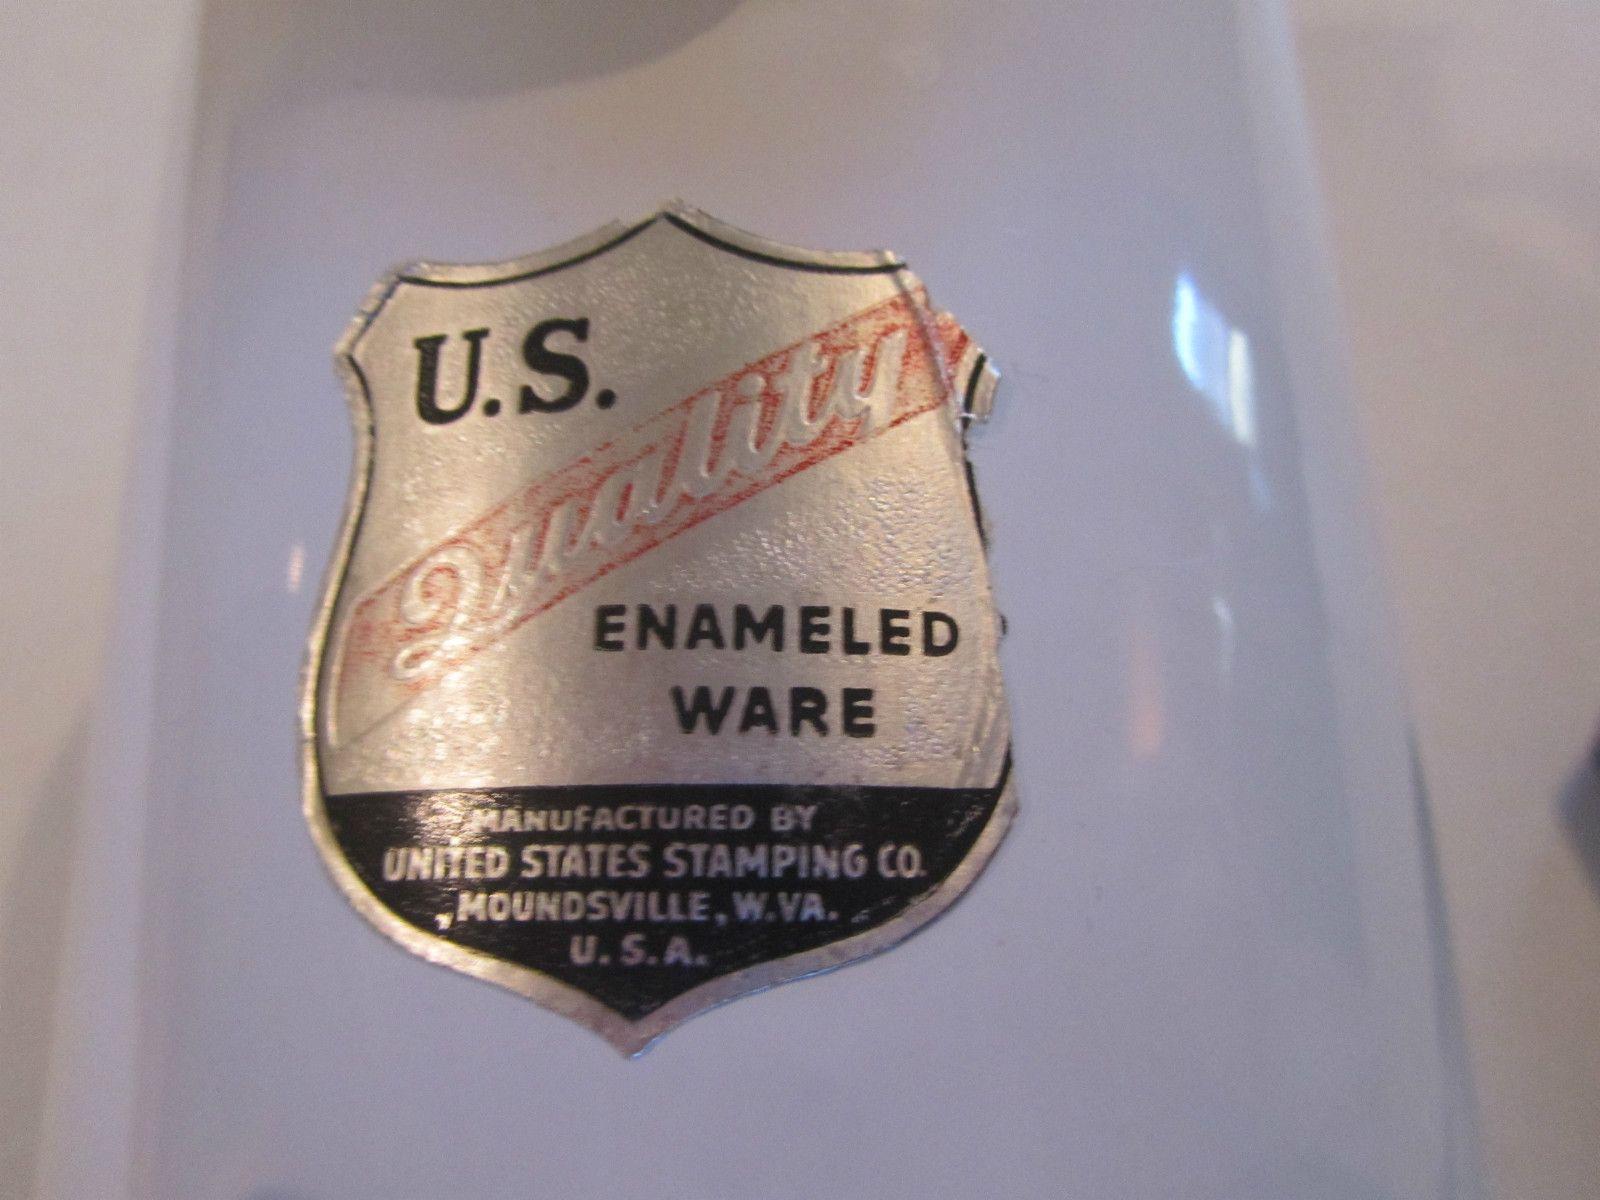 Vintage U s Quality Enamel Ware Urinal White Good Condition Moundsville w VA | eBay